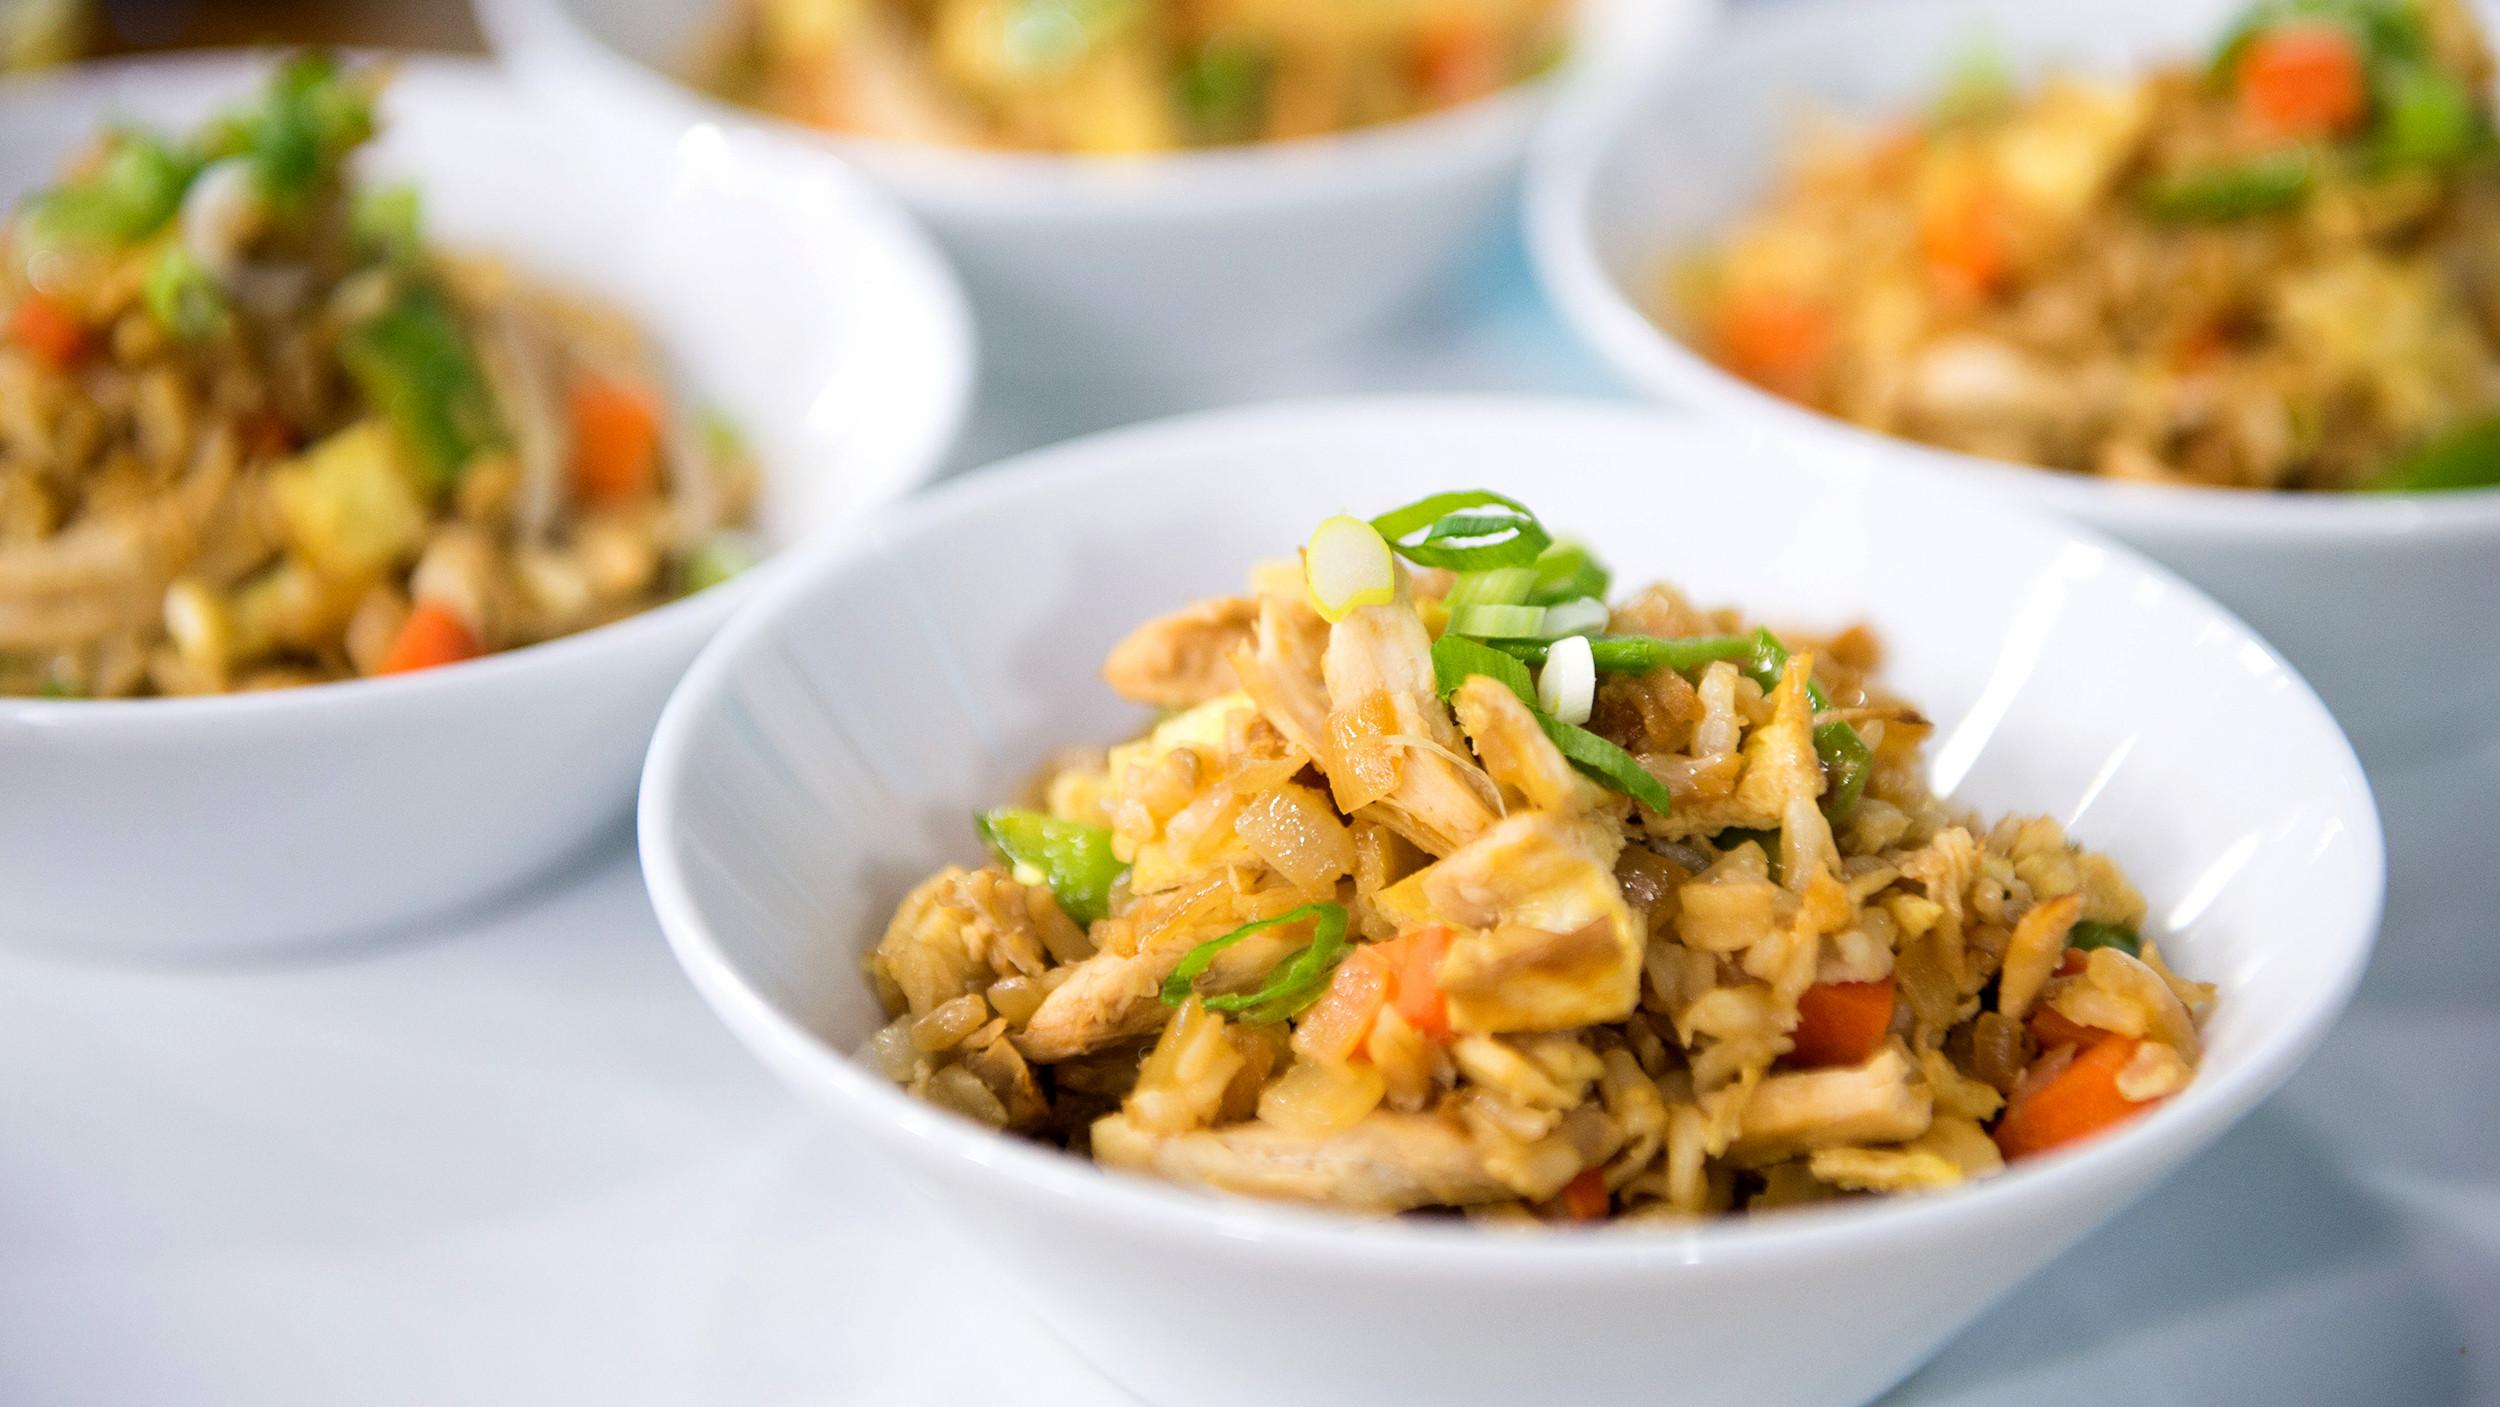 Healthy Chicken Fried Rice  Joy Bauer s healthy chicken fried rice and pancake recipes